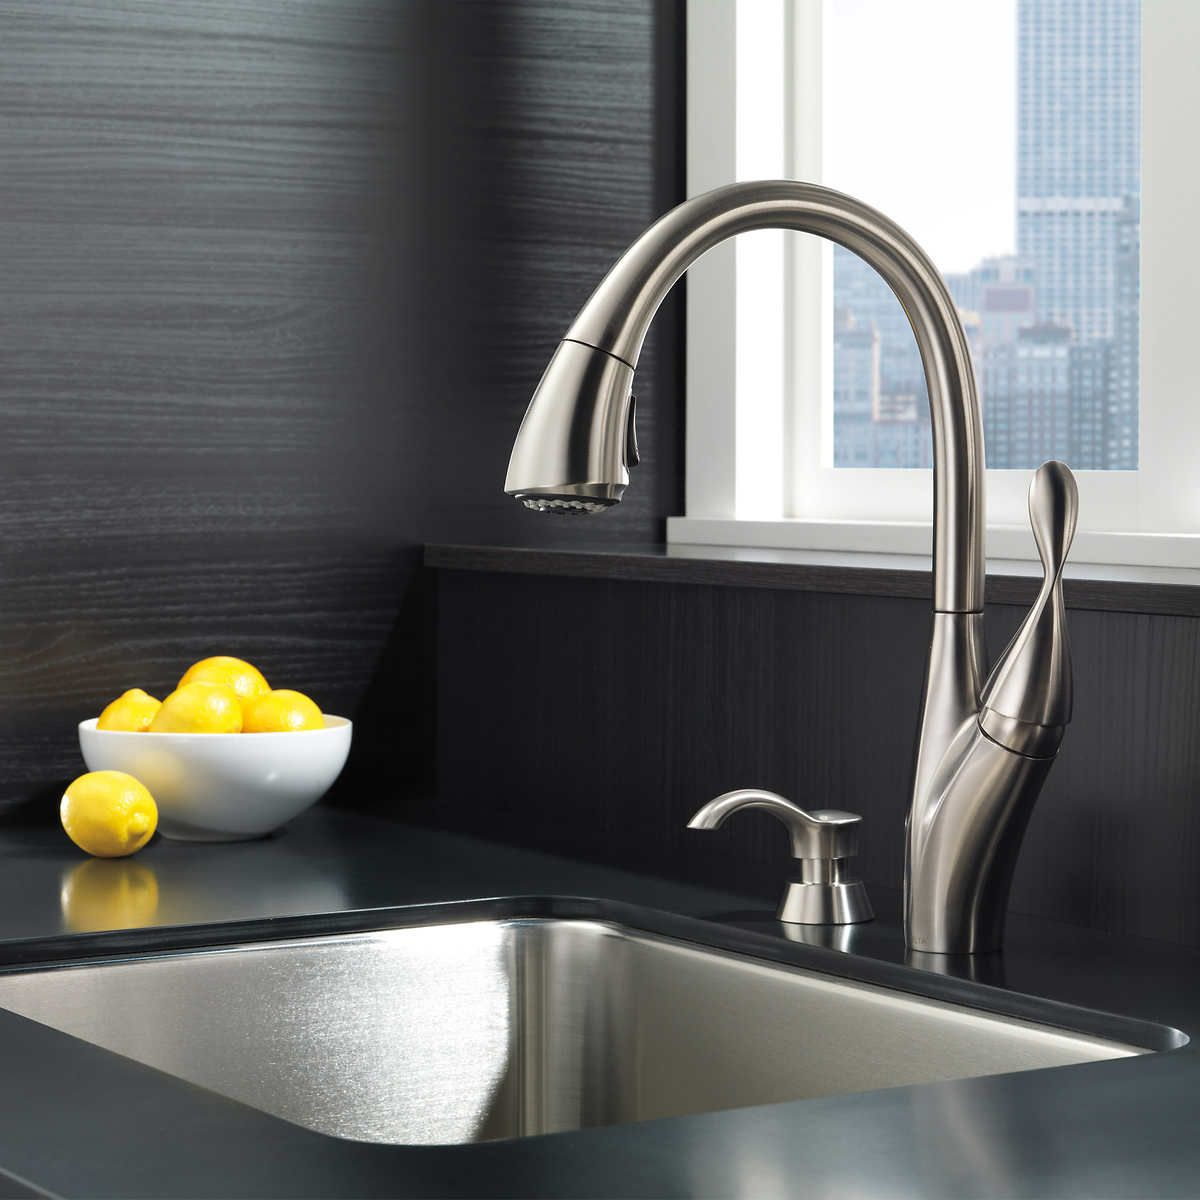 Delta Berkley Pulldown Kitchen Faucet And Soap Dispenser In 2020